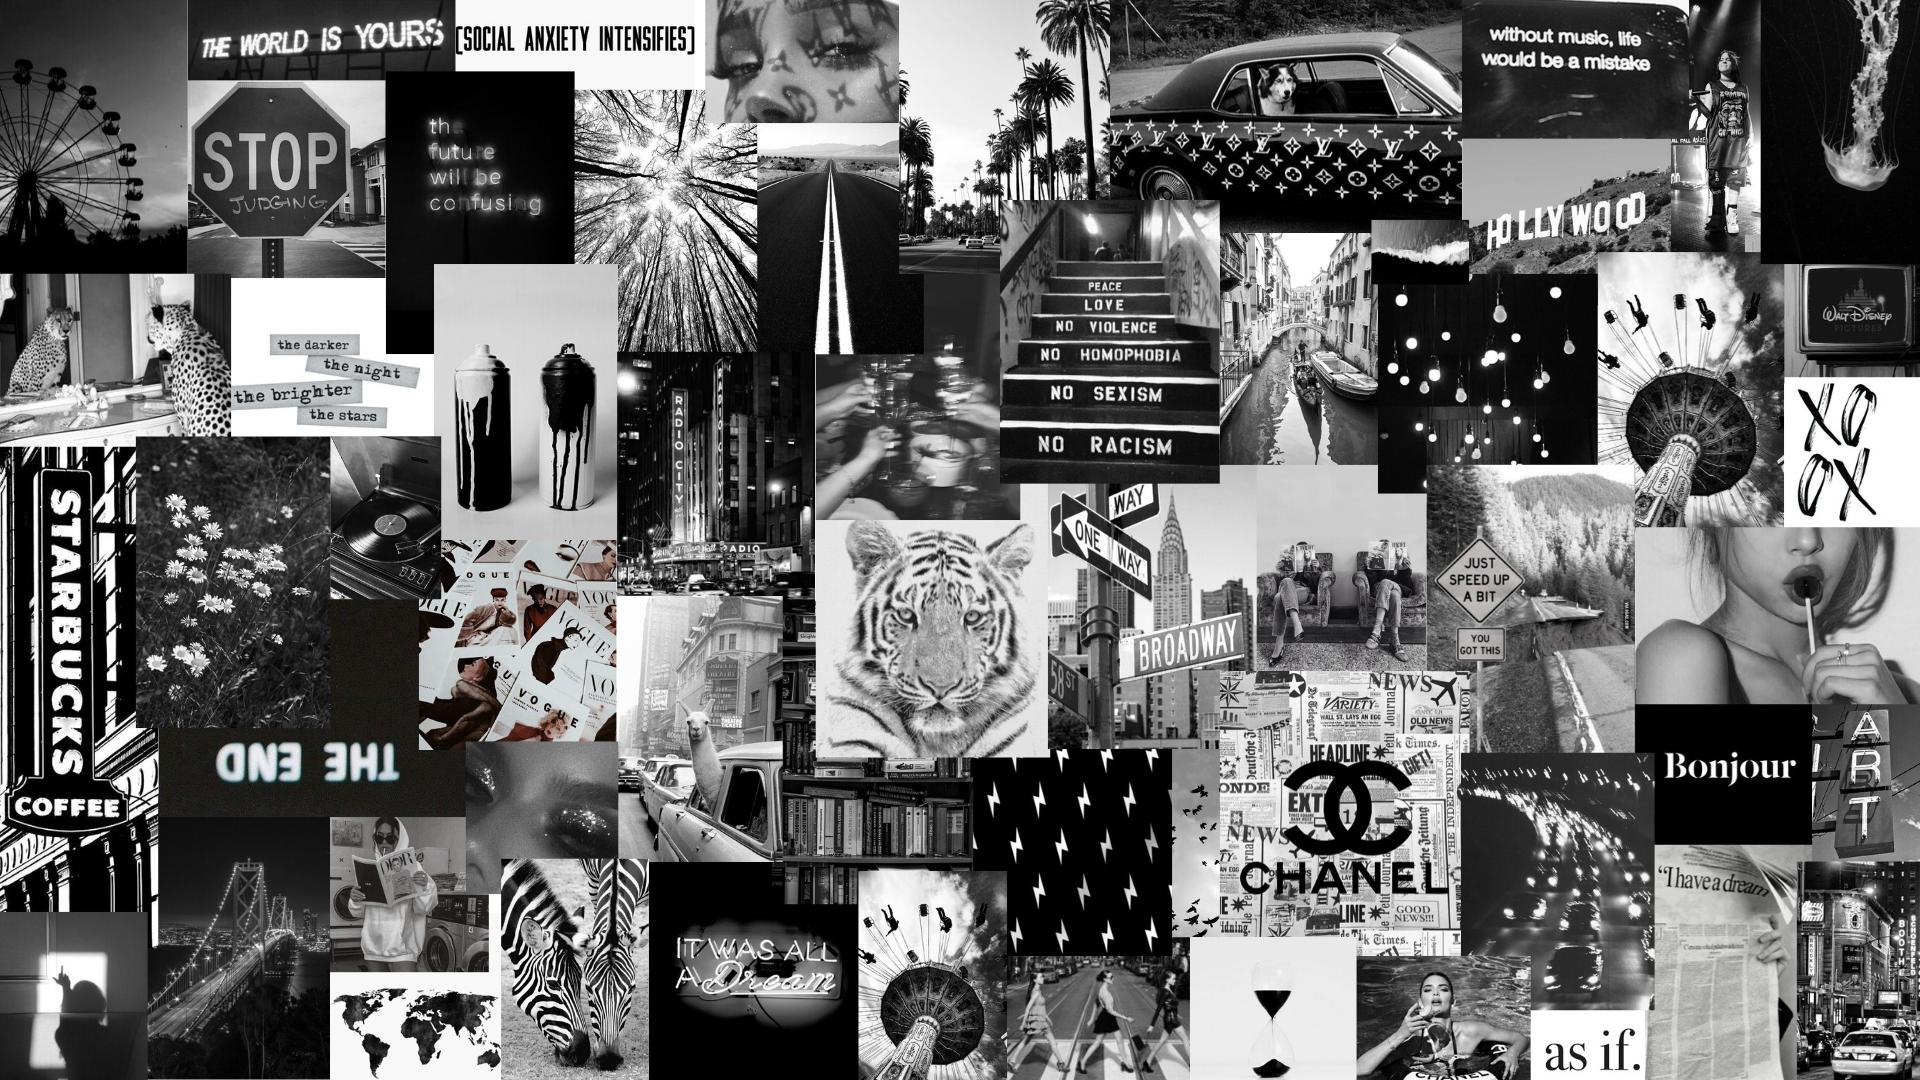 Macbook Aesthetic Desktop Wallpaper Macbook Wallpaper Macbook Screensaver